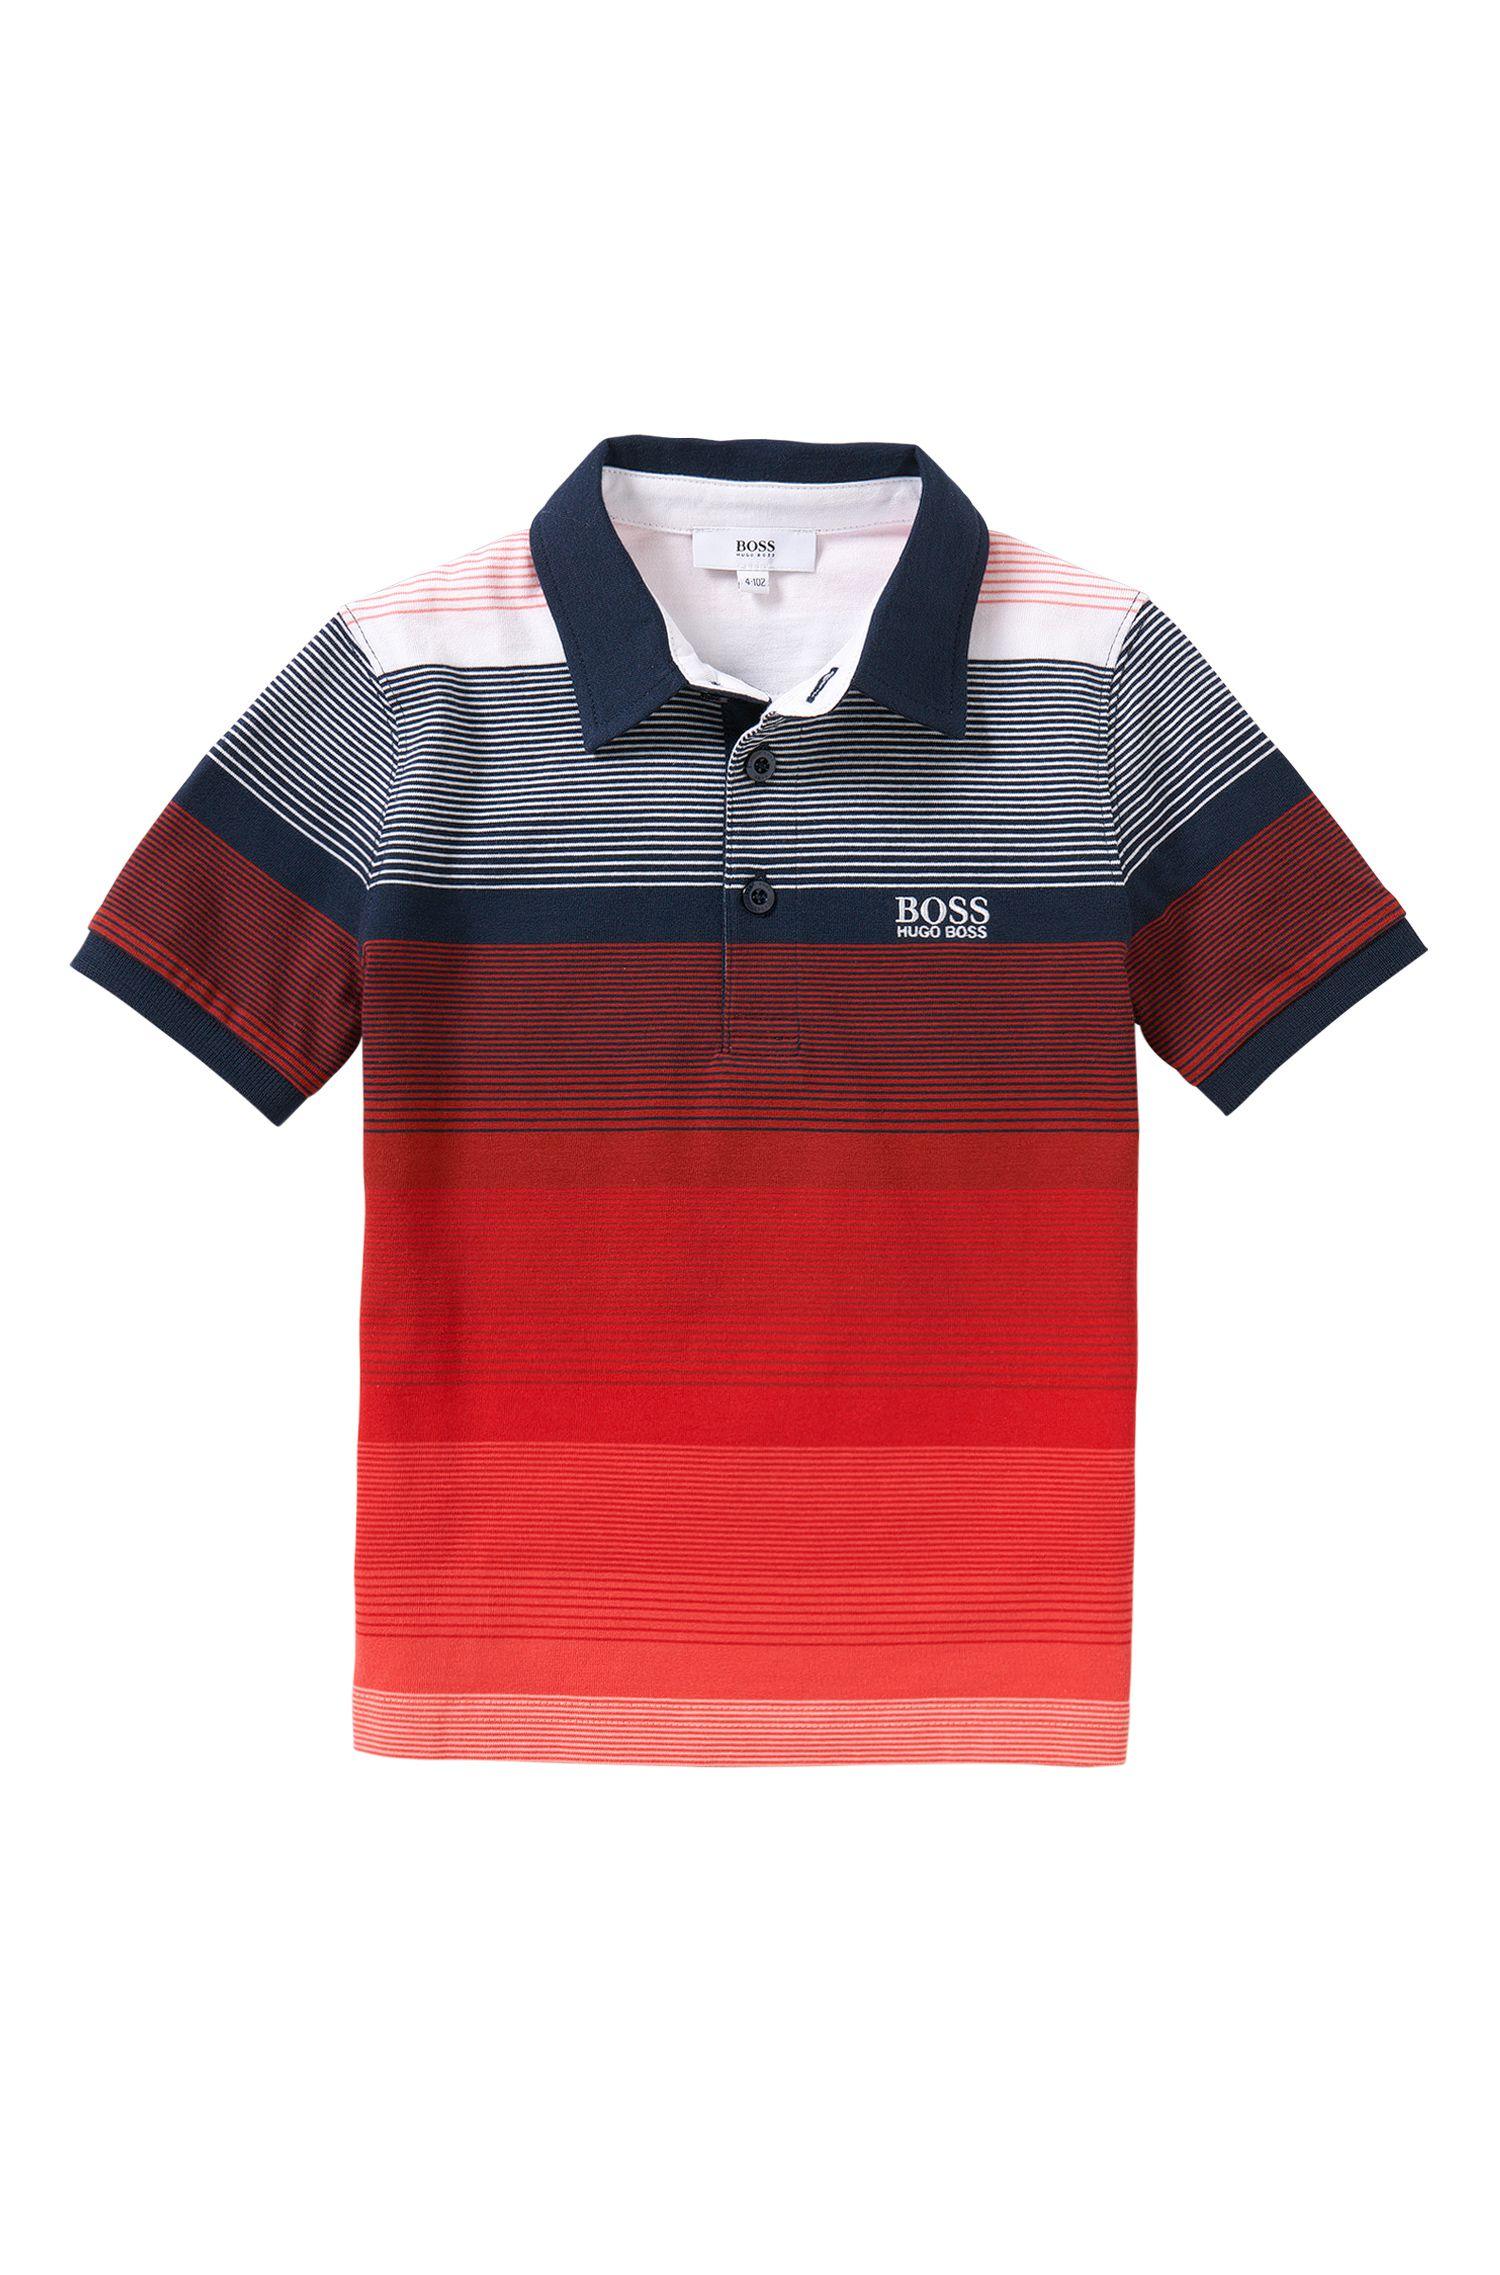 Gestreiftes Kids-Poloshirt aus Baumwolle: 'J25916'